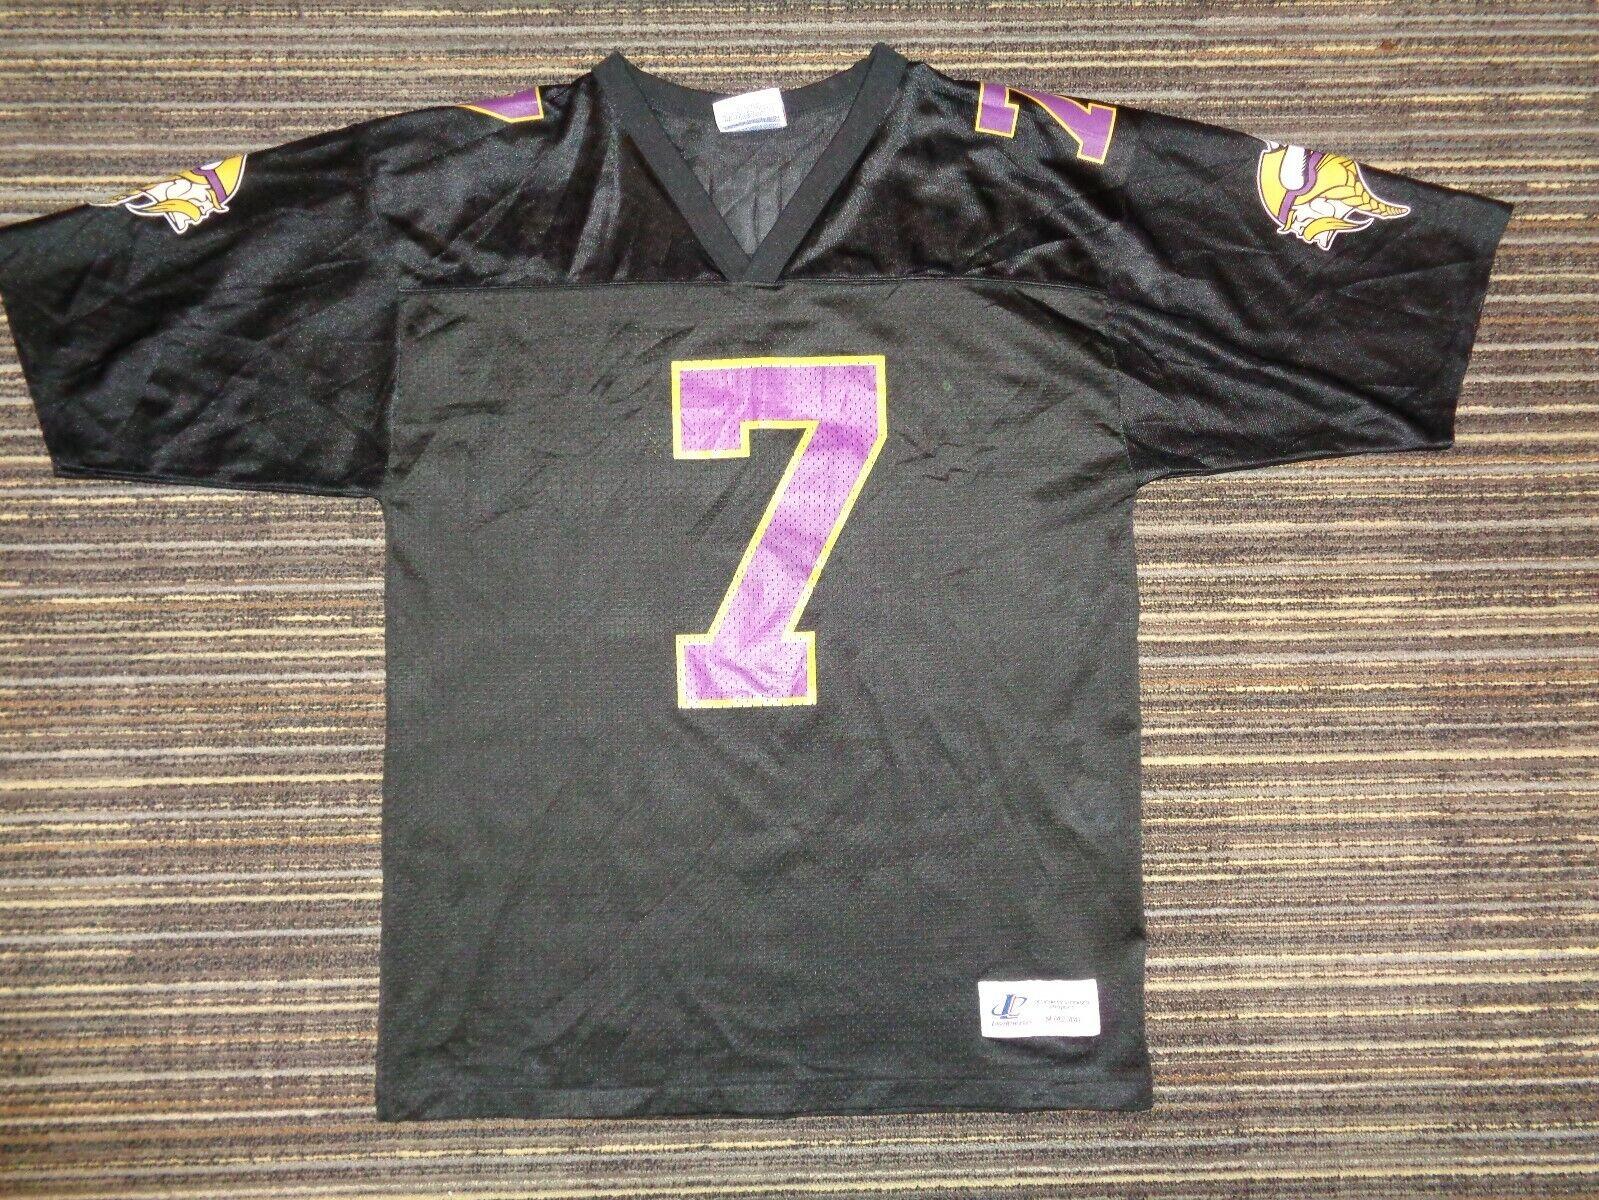 RANDALL CUNNINGHAM 7 MINNESOTA VIKINGS PUMA BLACK NFL GAME FOOTBALL JERSEY SZ M - $49.99